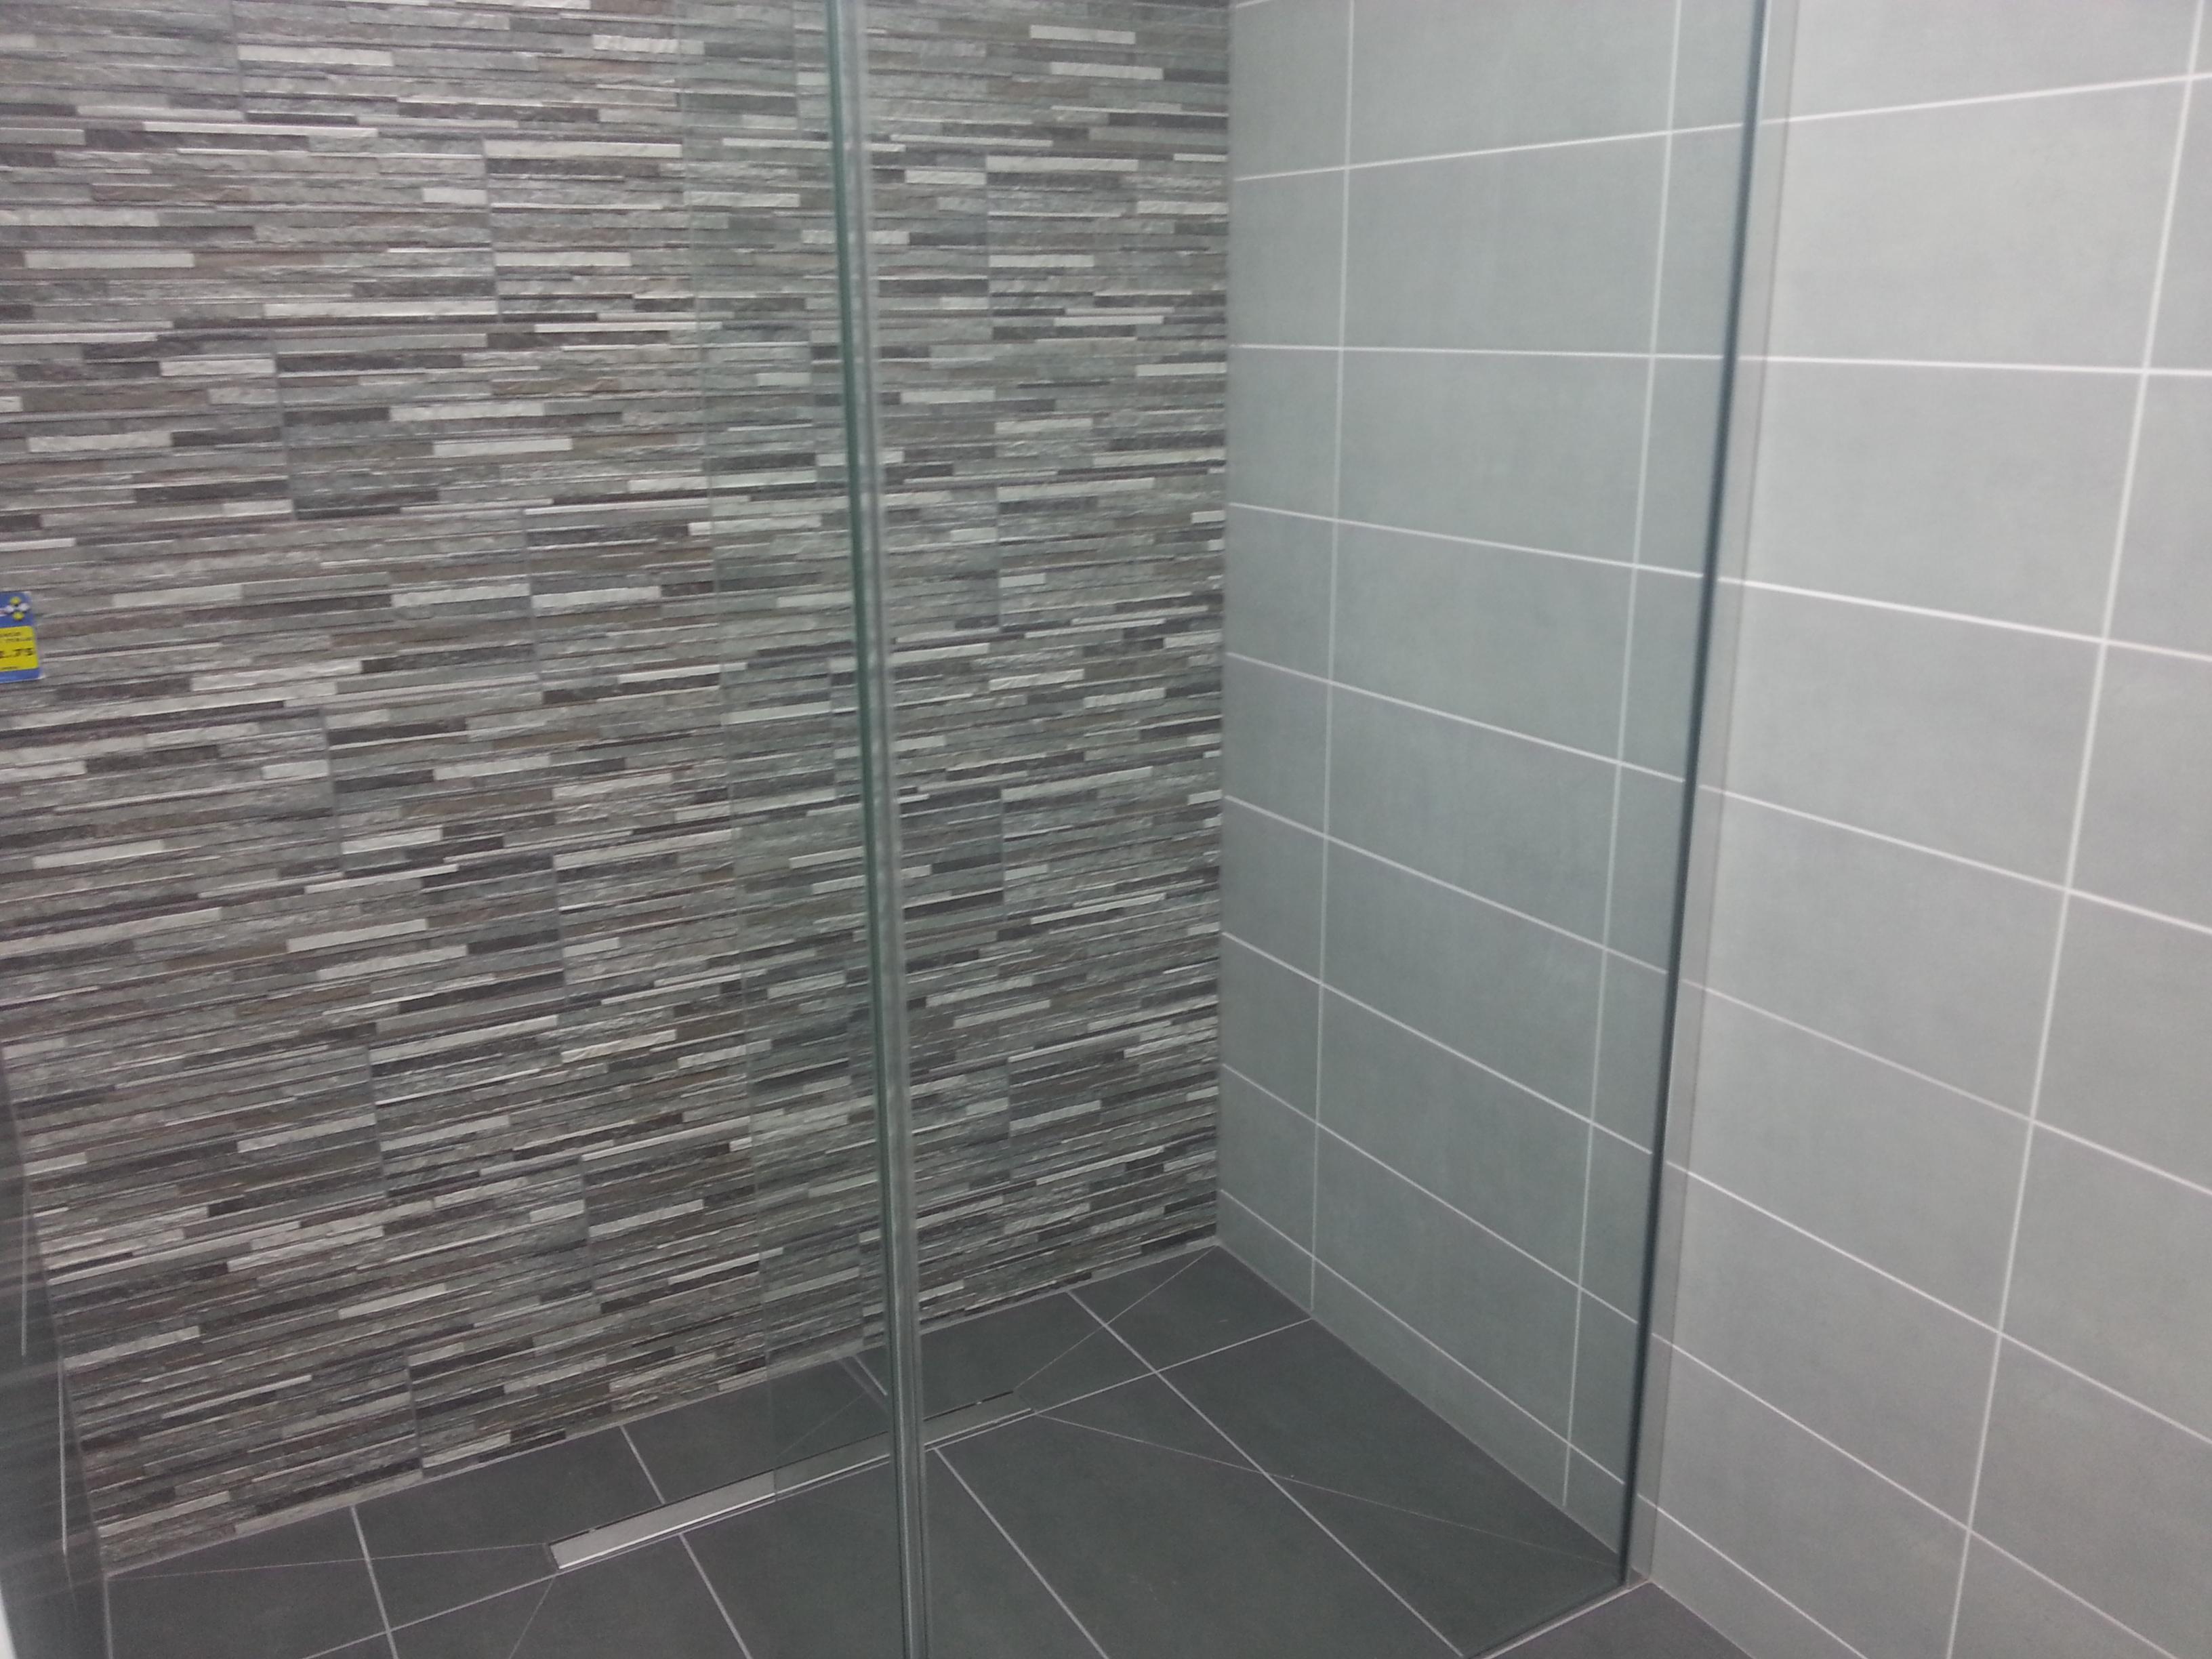 Choosing wall and floor tiles